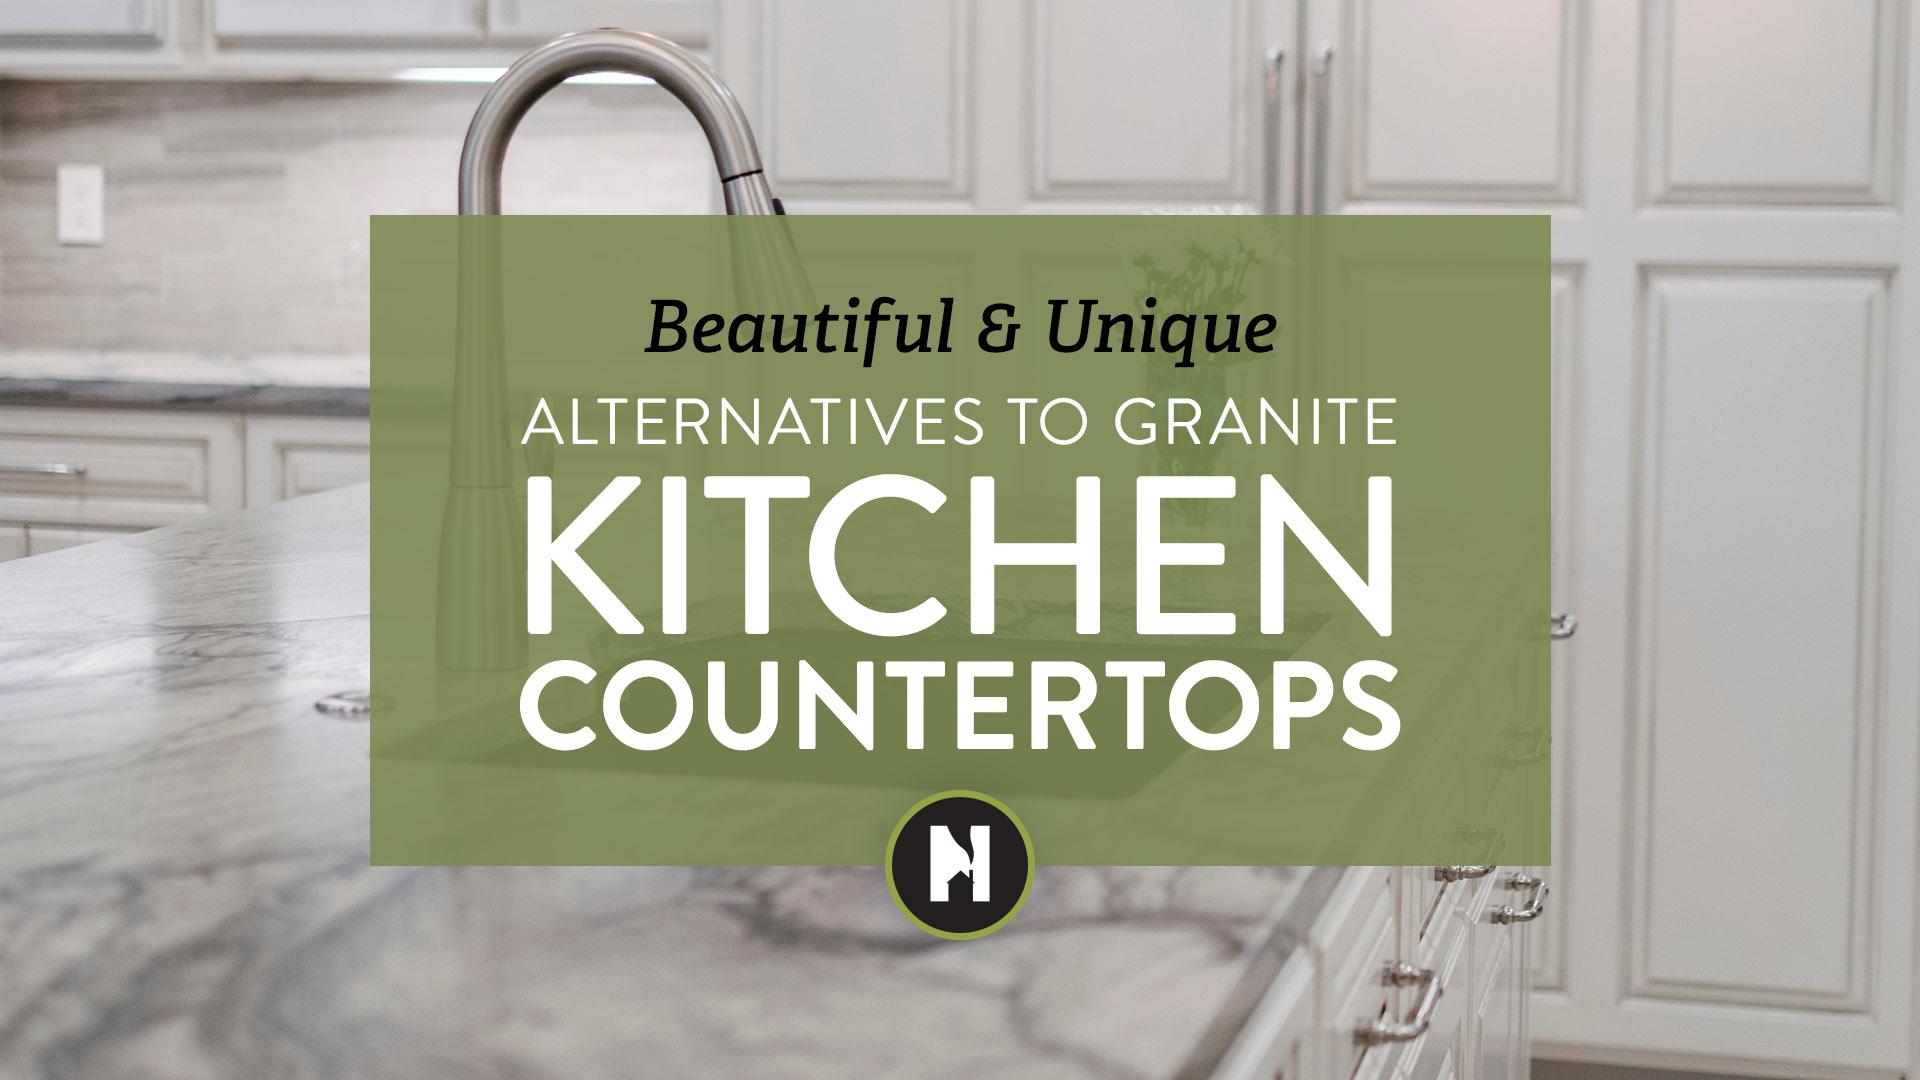 Niece Kitchen Countertops